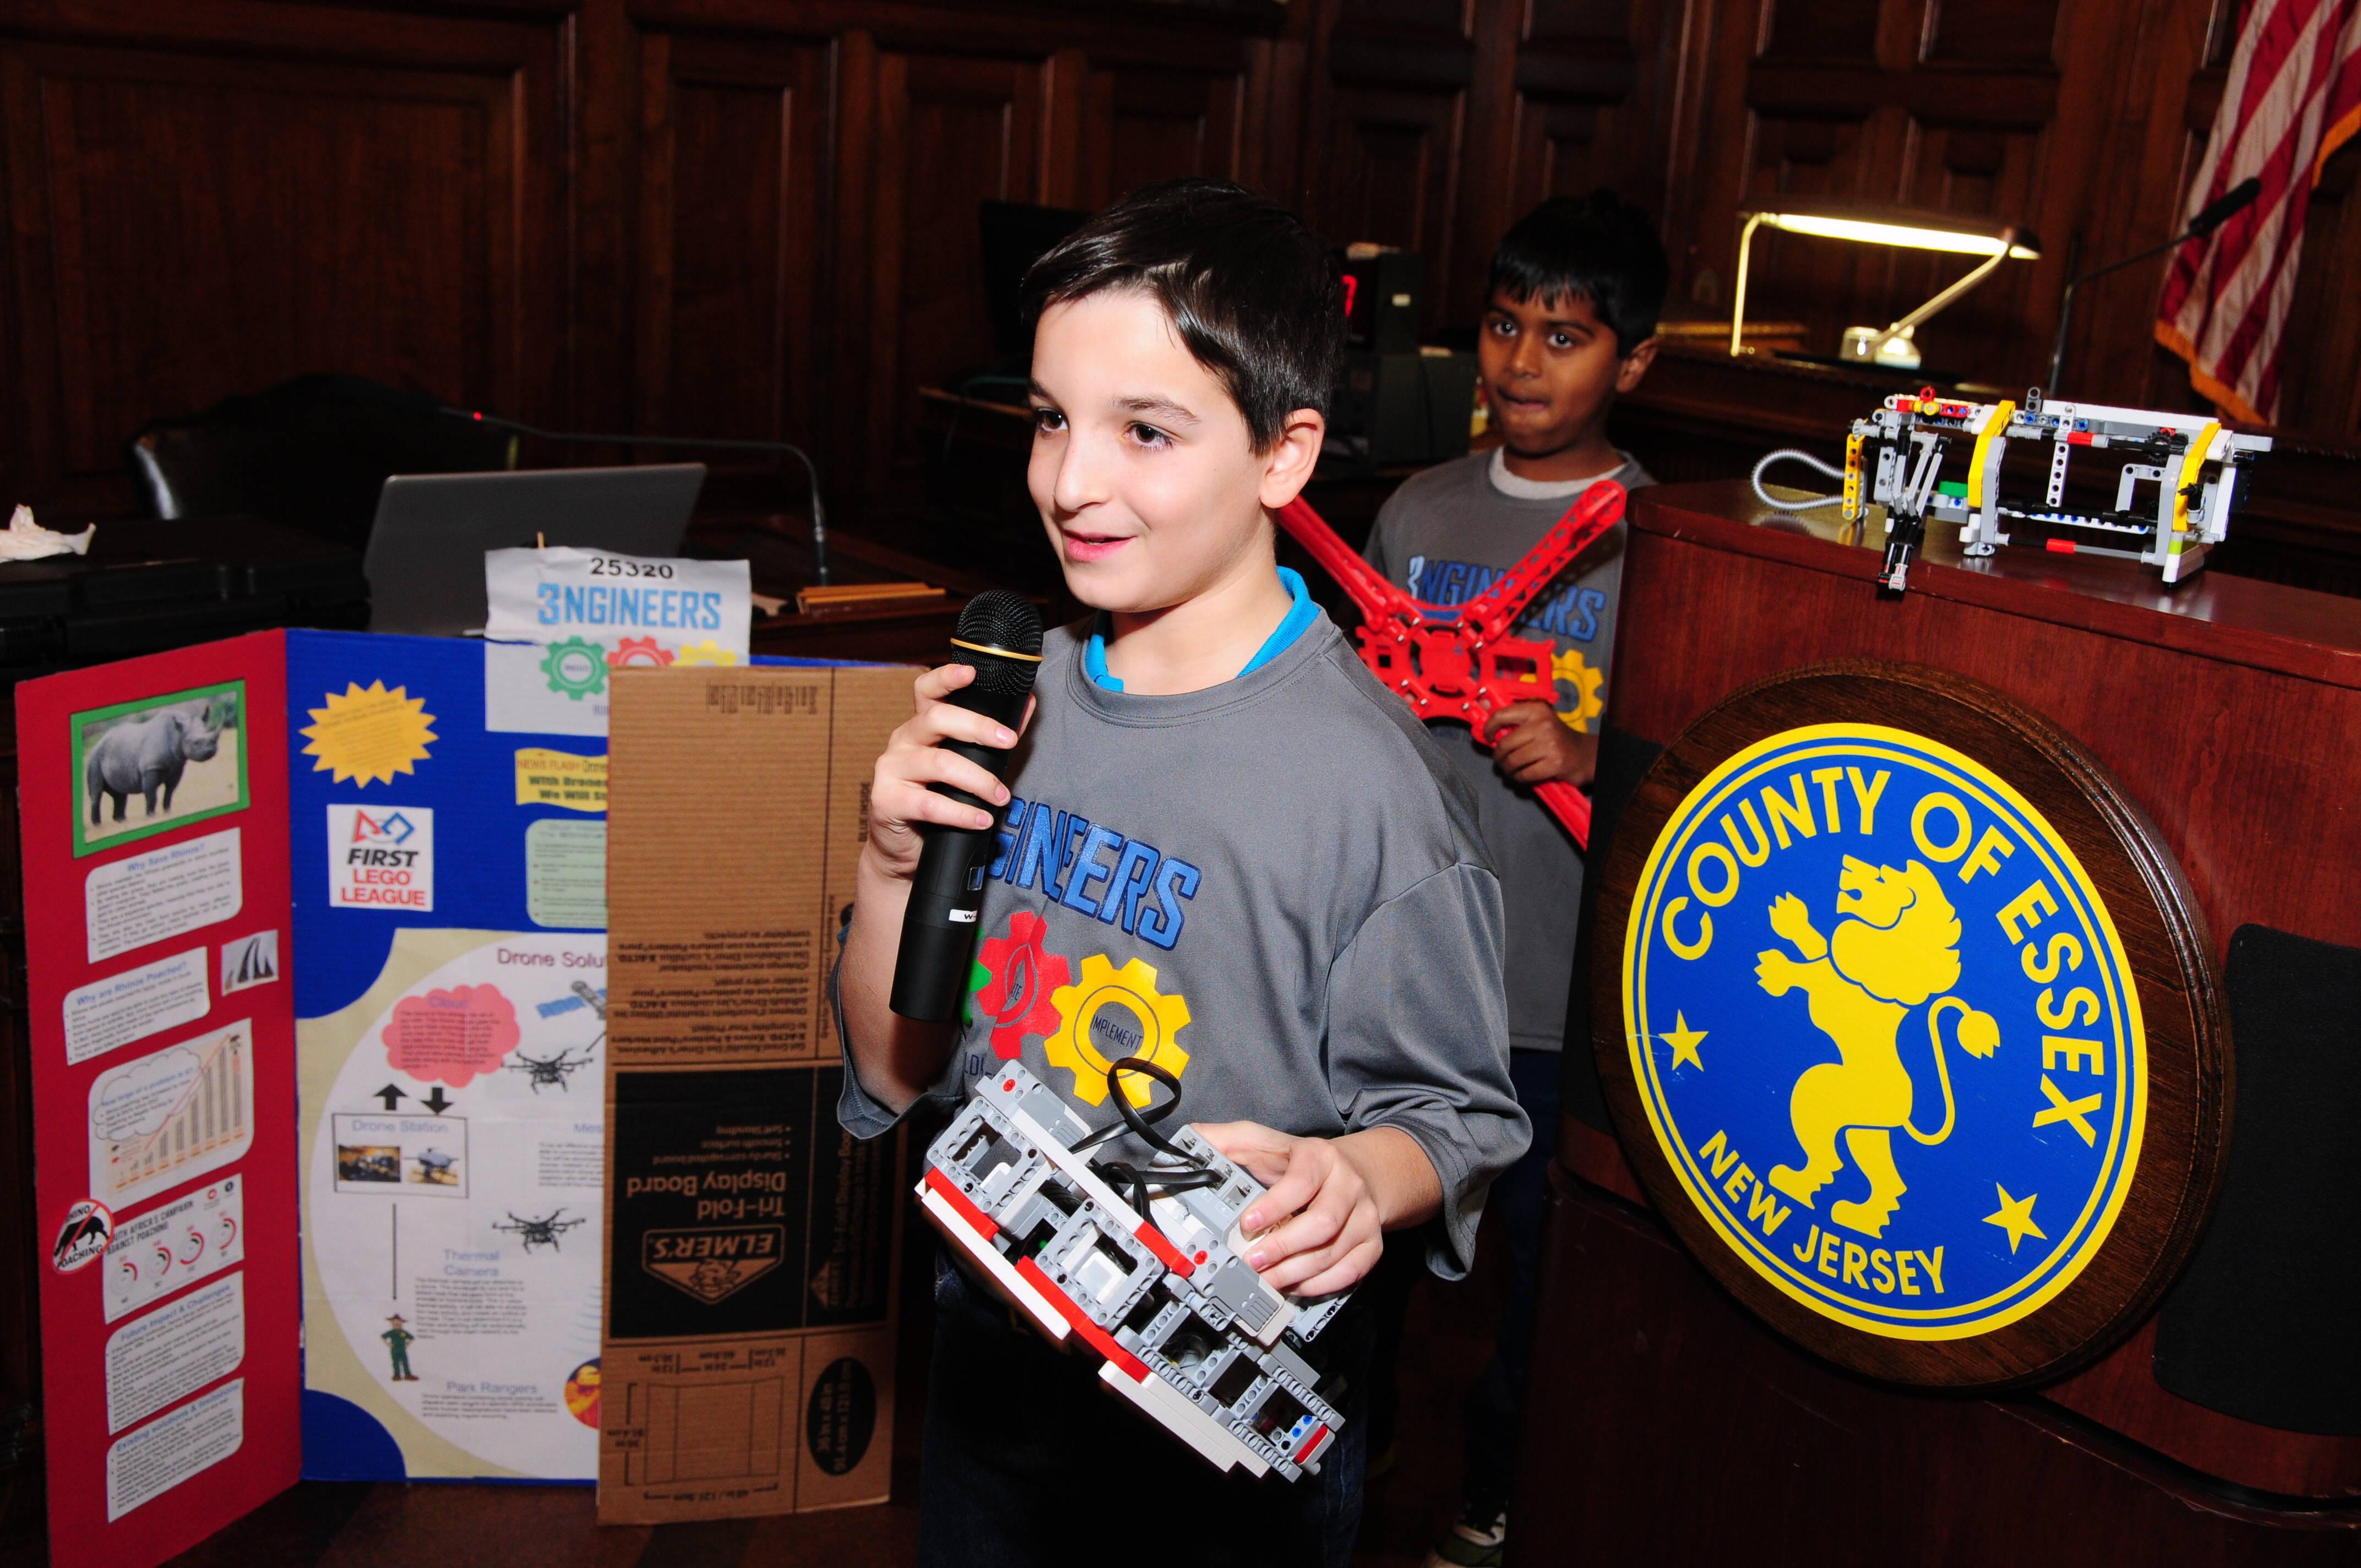 Essex County Freeholders Honor Livingston Robotics Club Teams